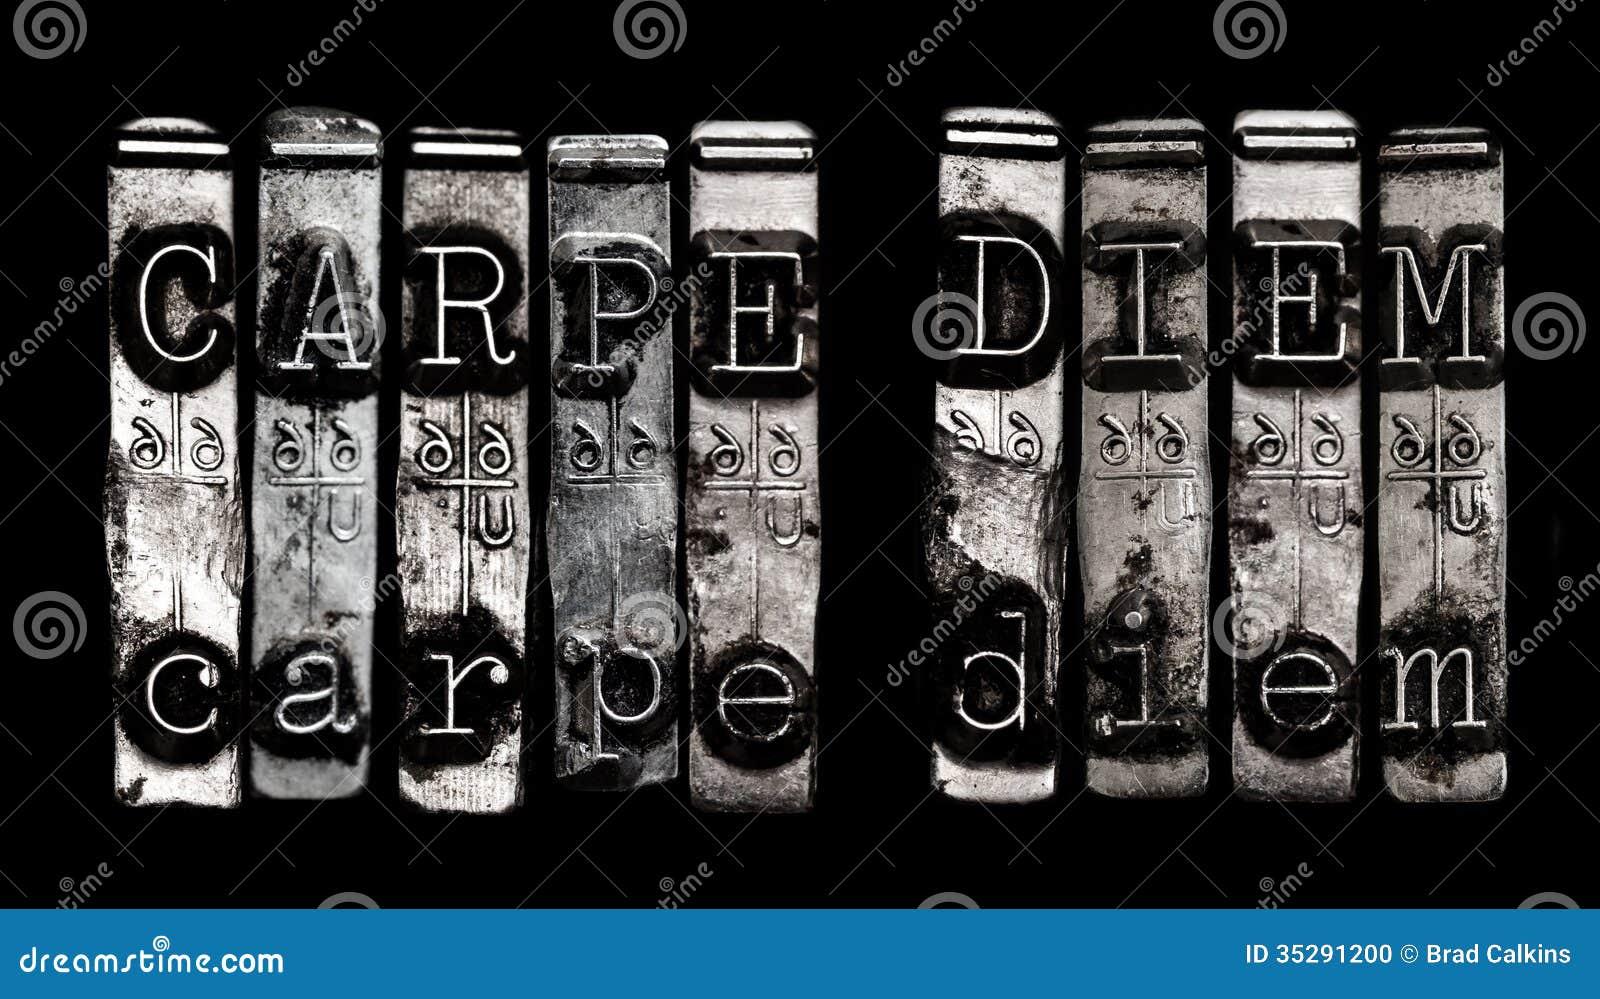 Carpe diem stock photo image 35291200